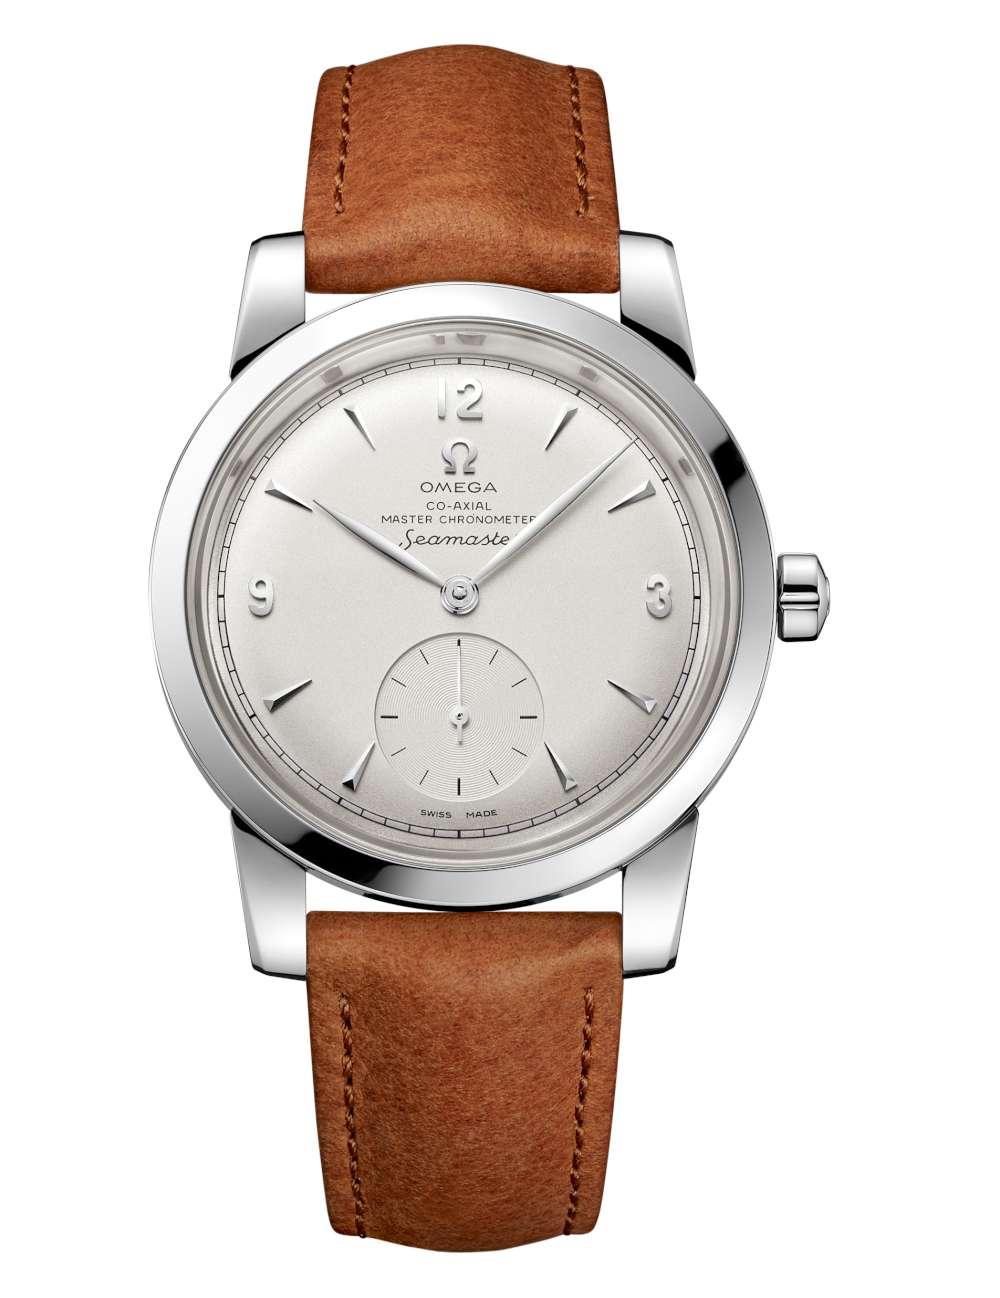 Omega Seamaster 1948 511.12.38.20.02.001 vintage style watch